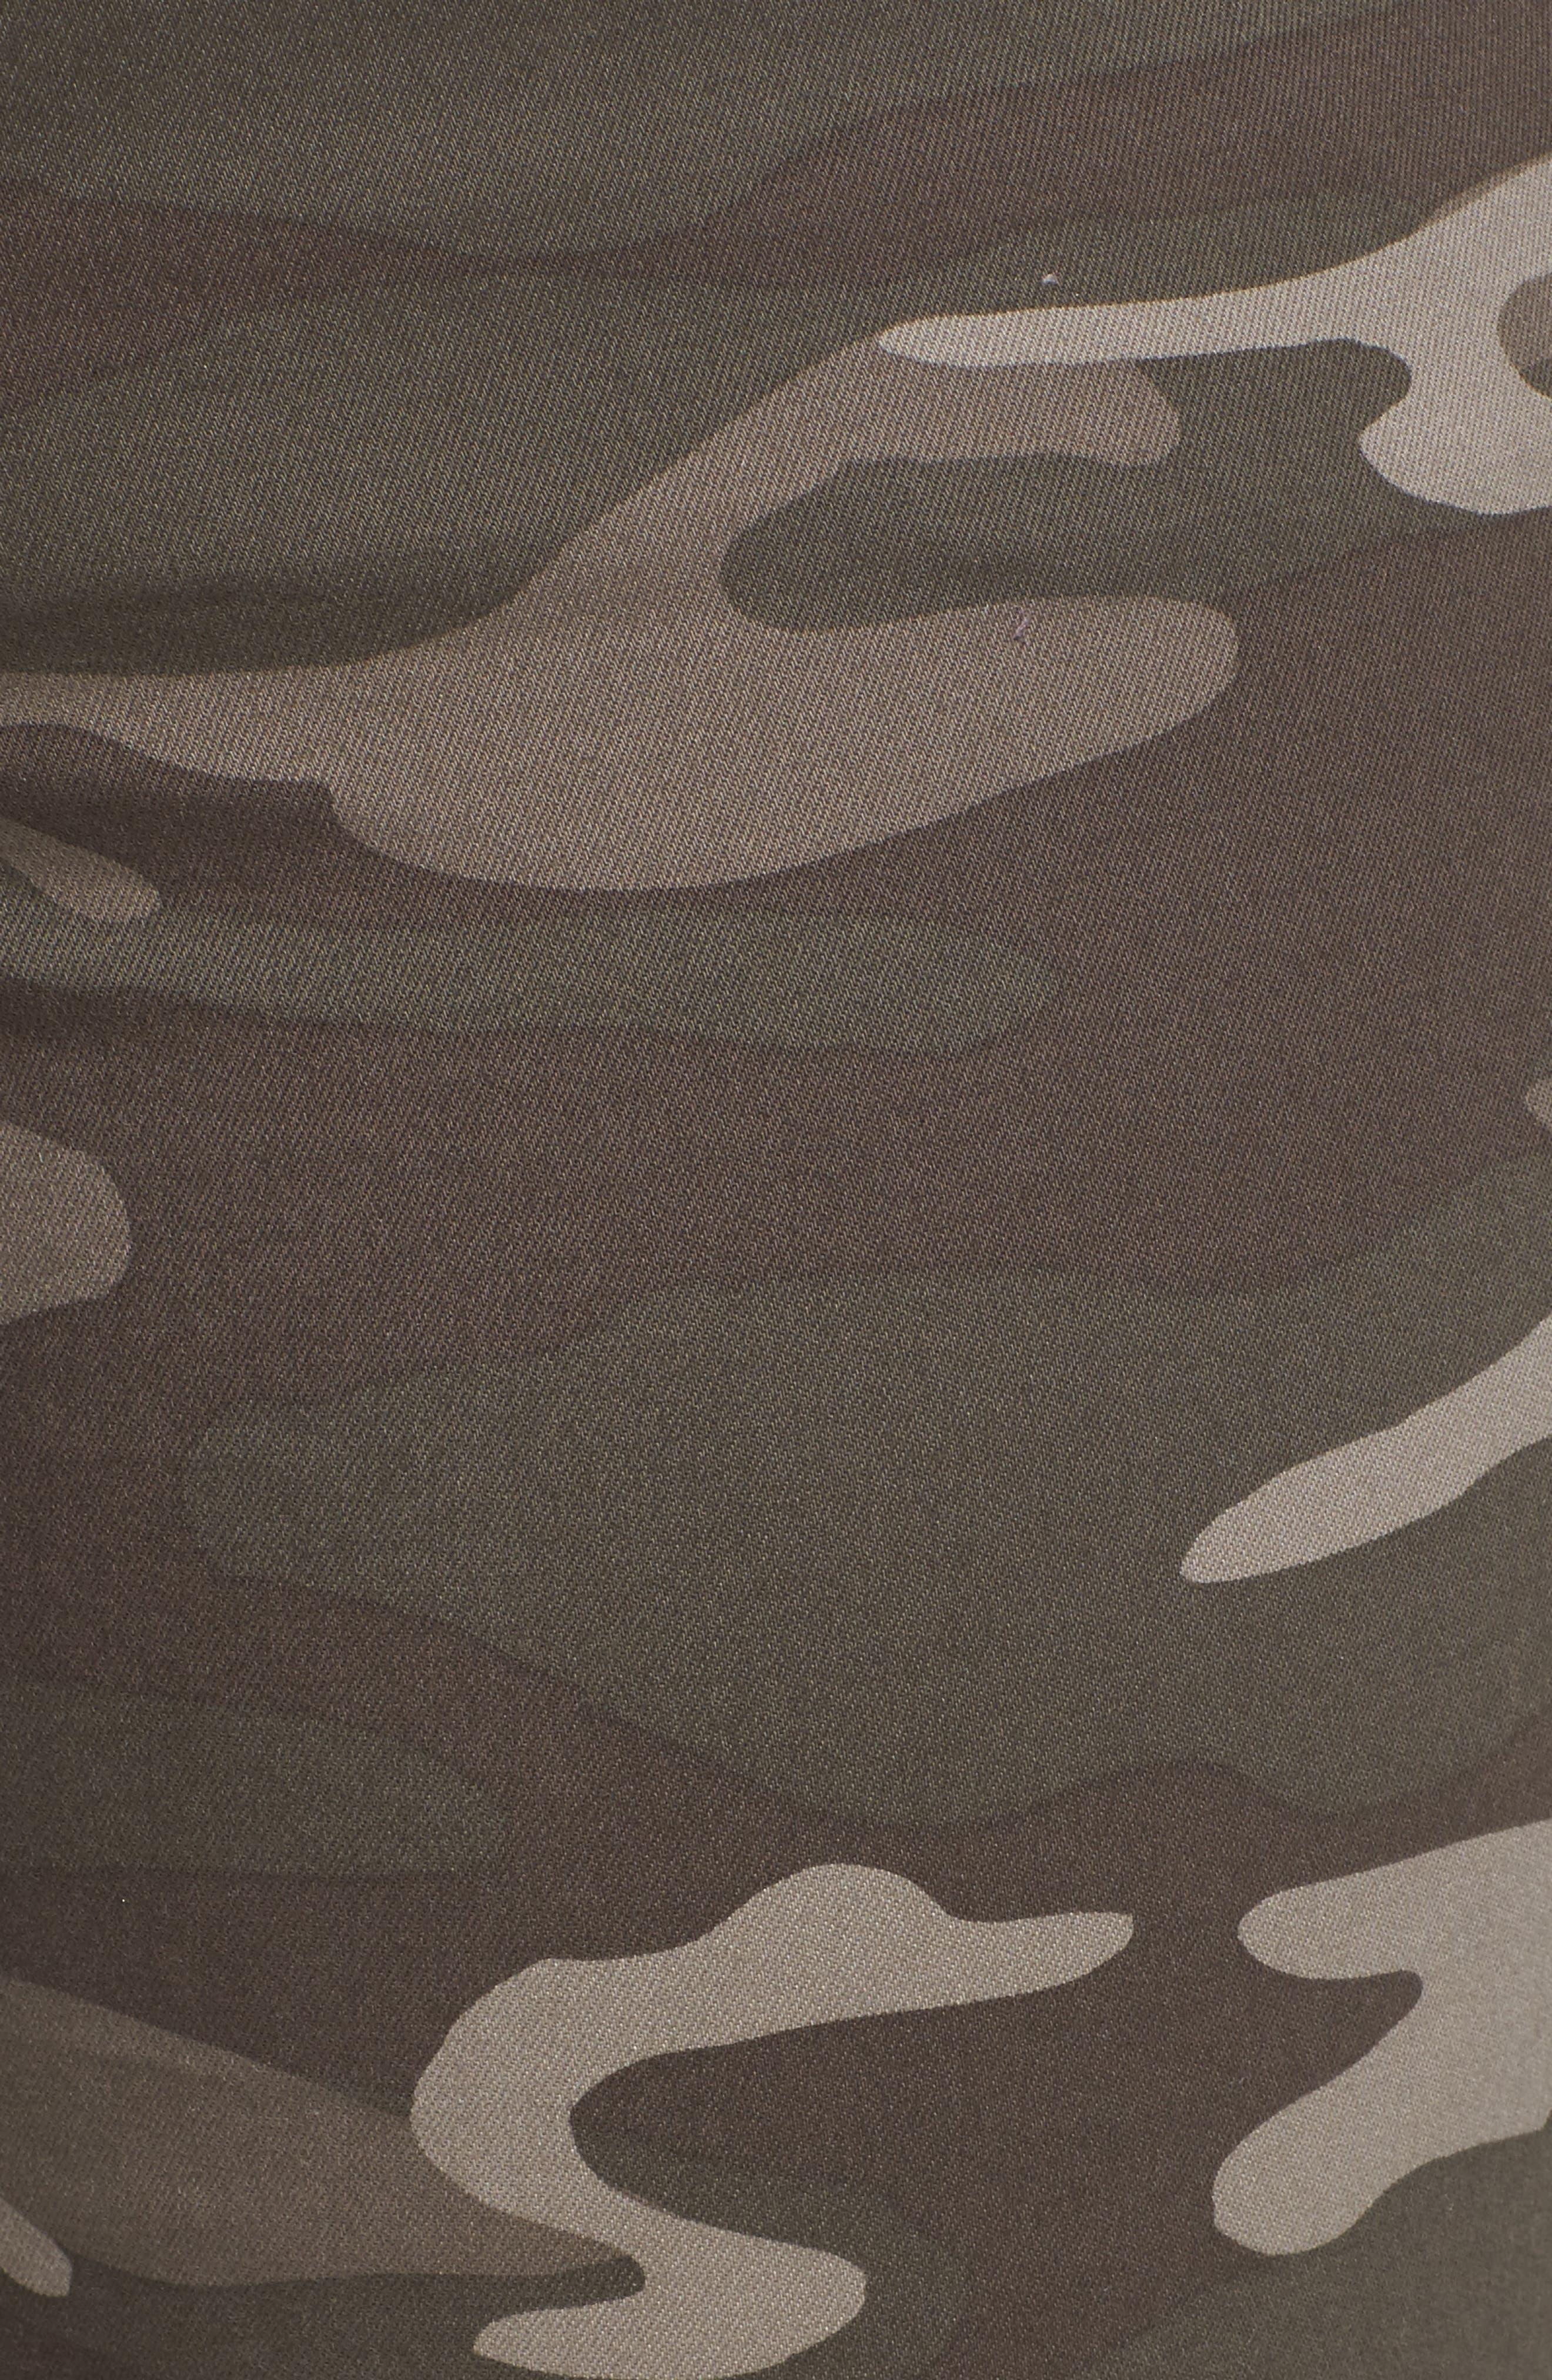 Ab-solution Ankle Skimmer Slit Pants,                             Alternate thumbnail 6, color,                             210